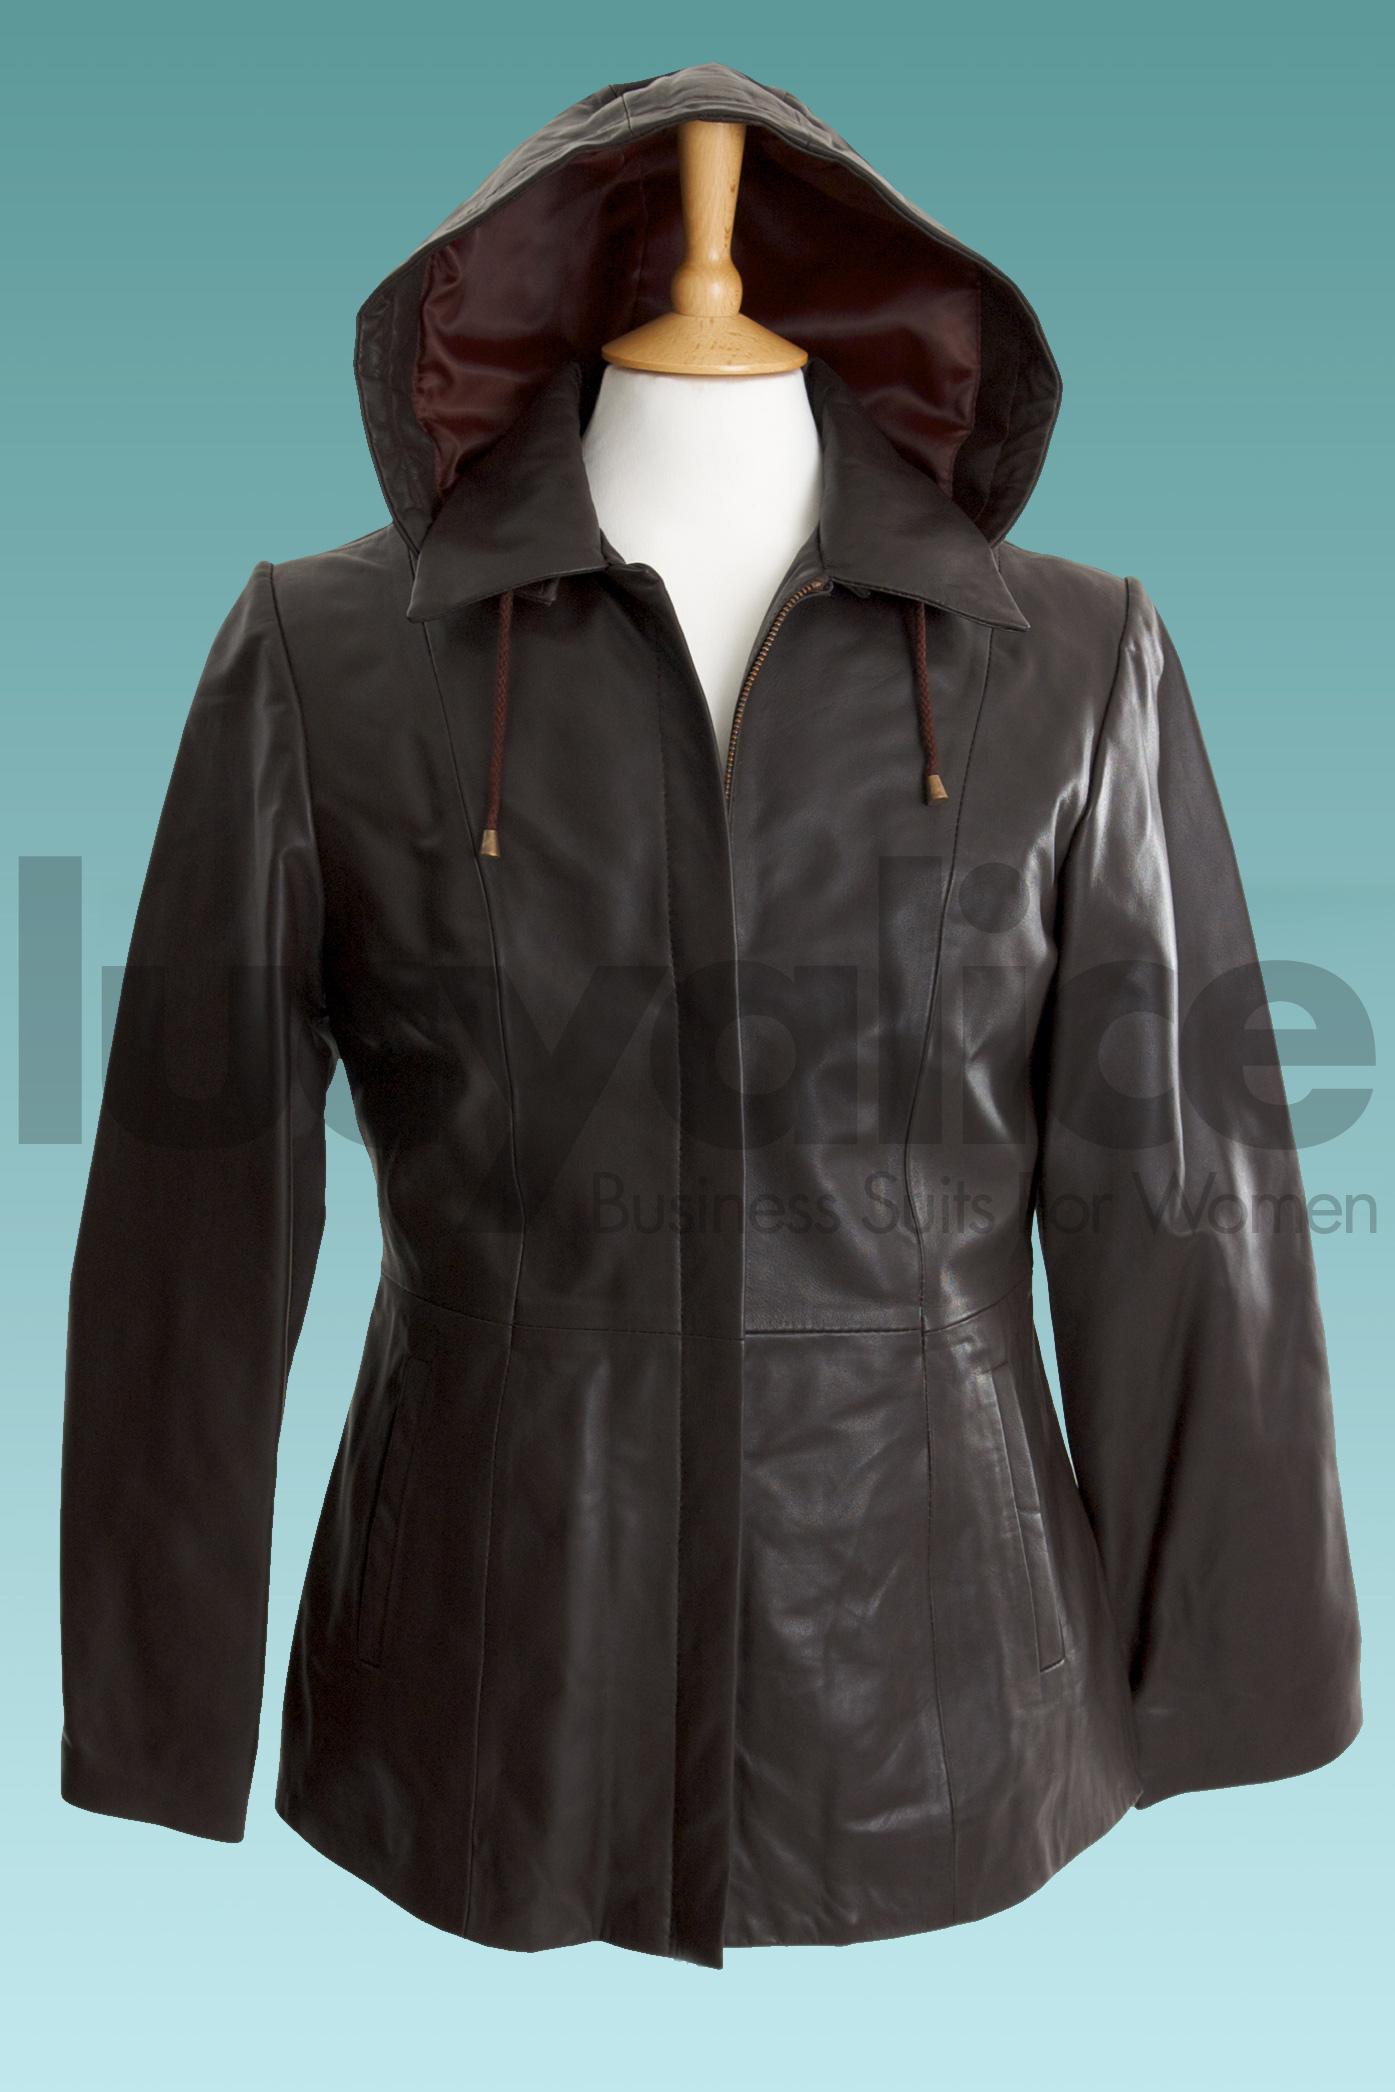 Las Leather Jackets